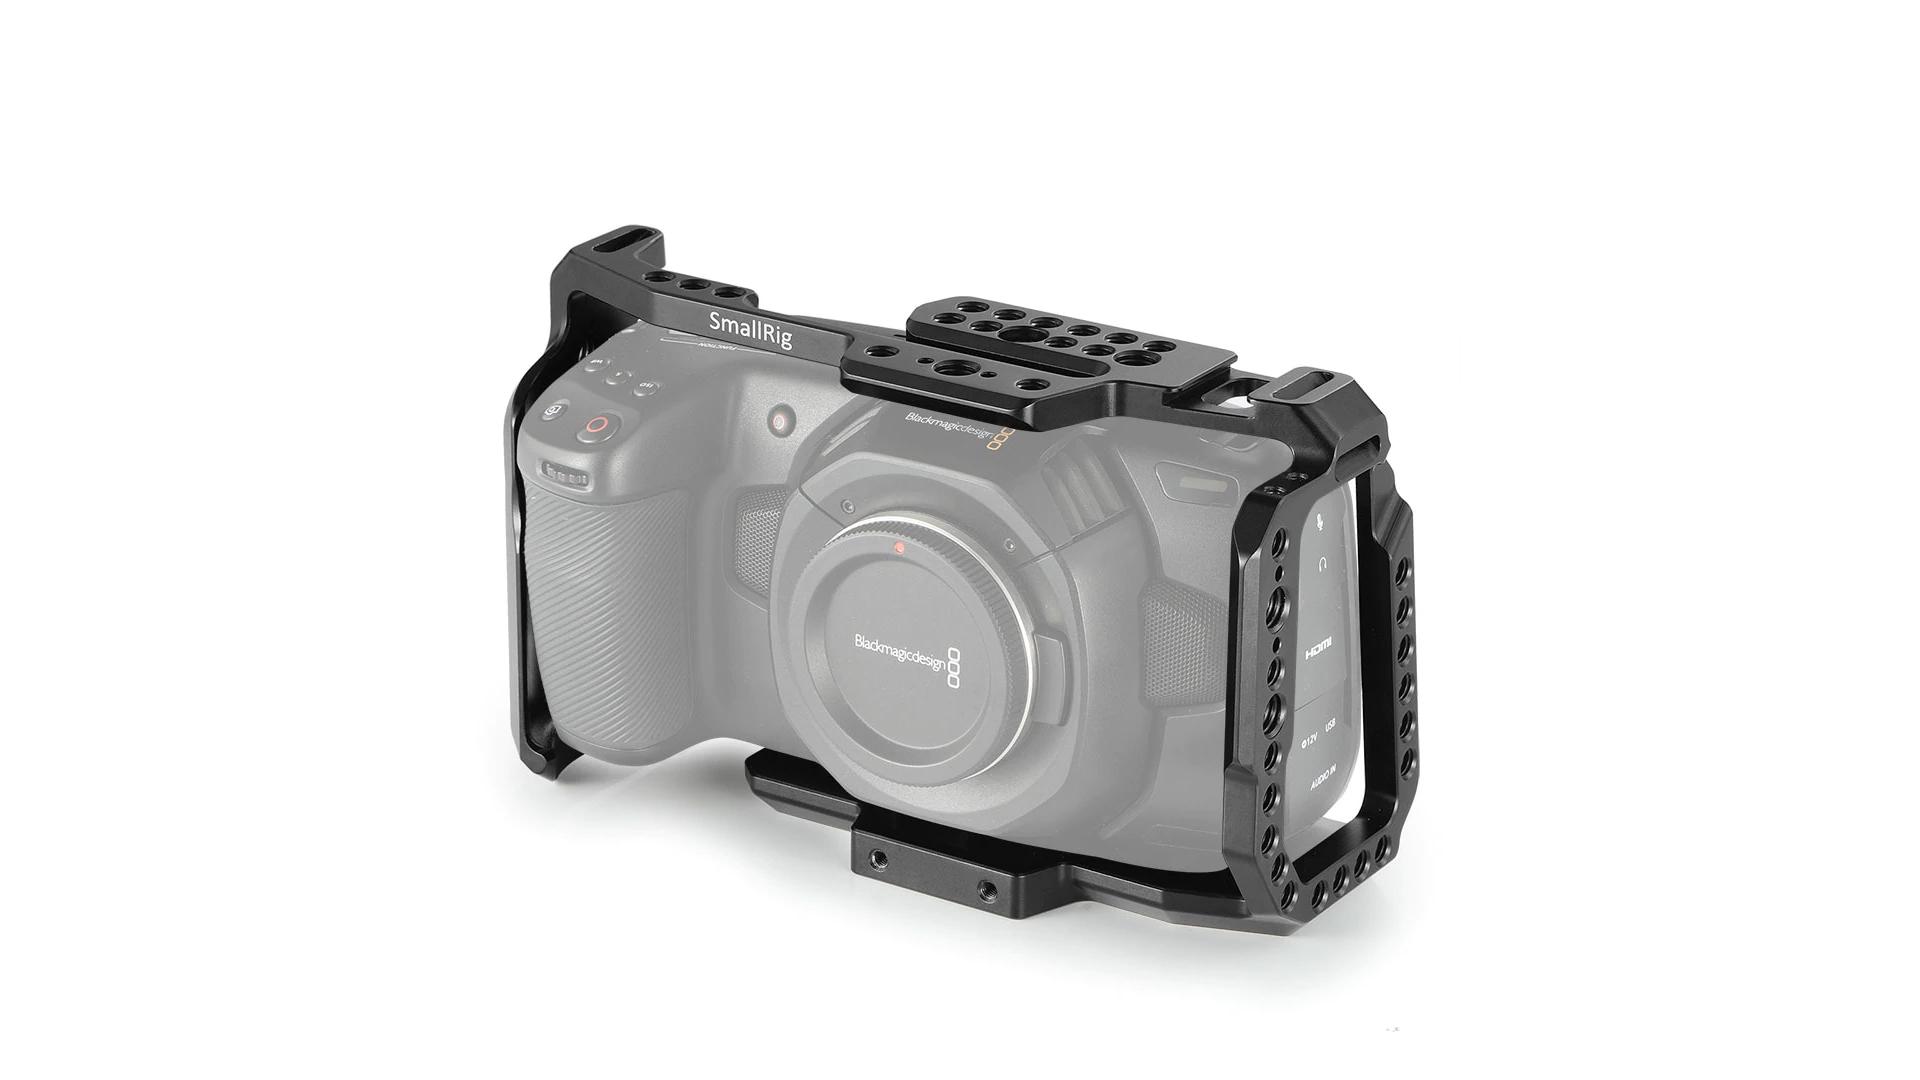 2203_Smallrig_SmallRig Cage for Blackmagic Design Pocket Cinema Camera 4K & 6K 2203_01